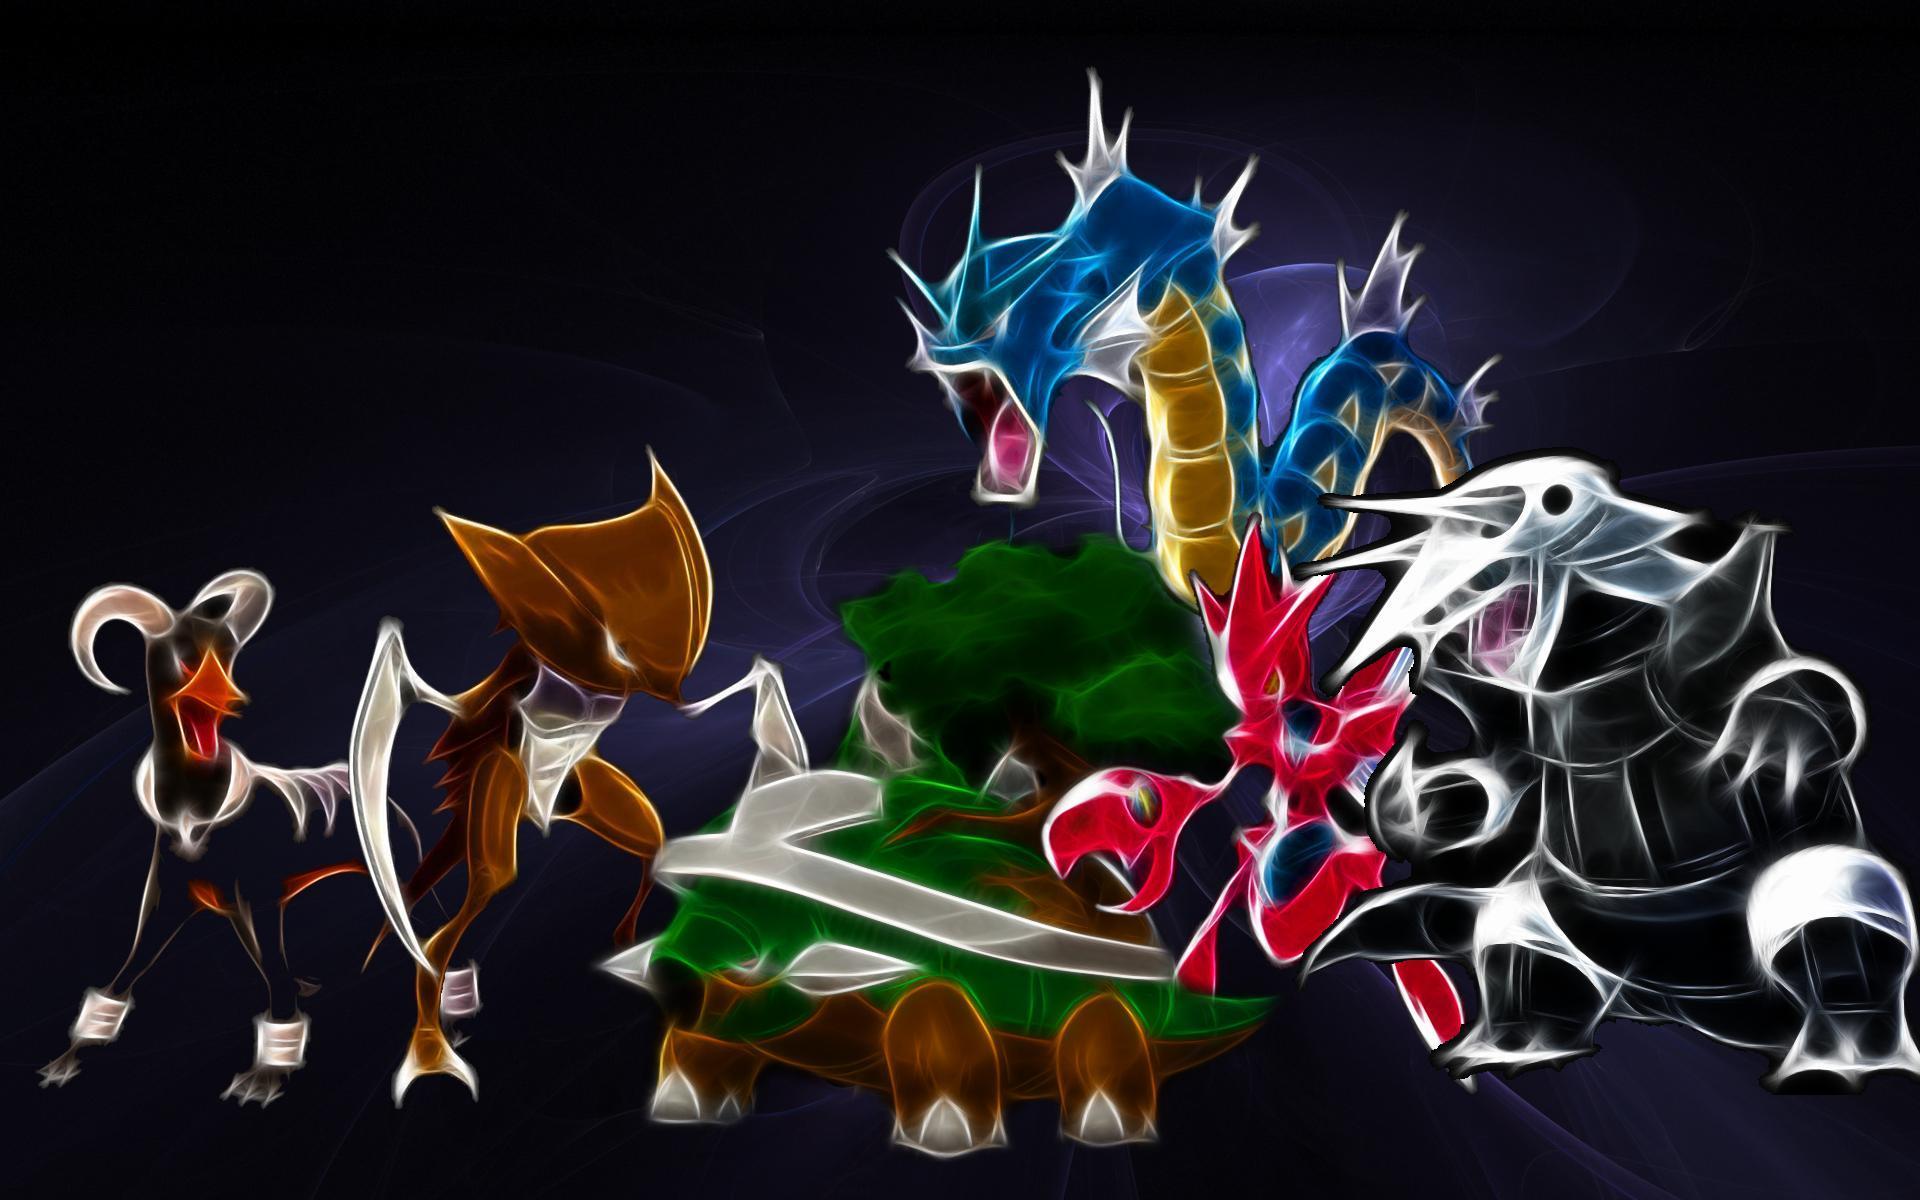 Shiny Pokémon Wallpapers - Wallpaper Cave